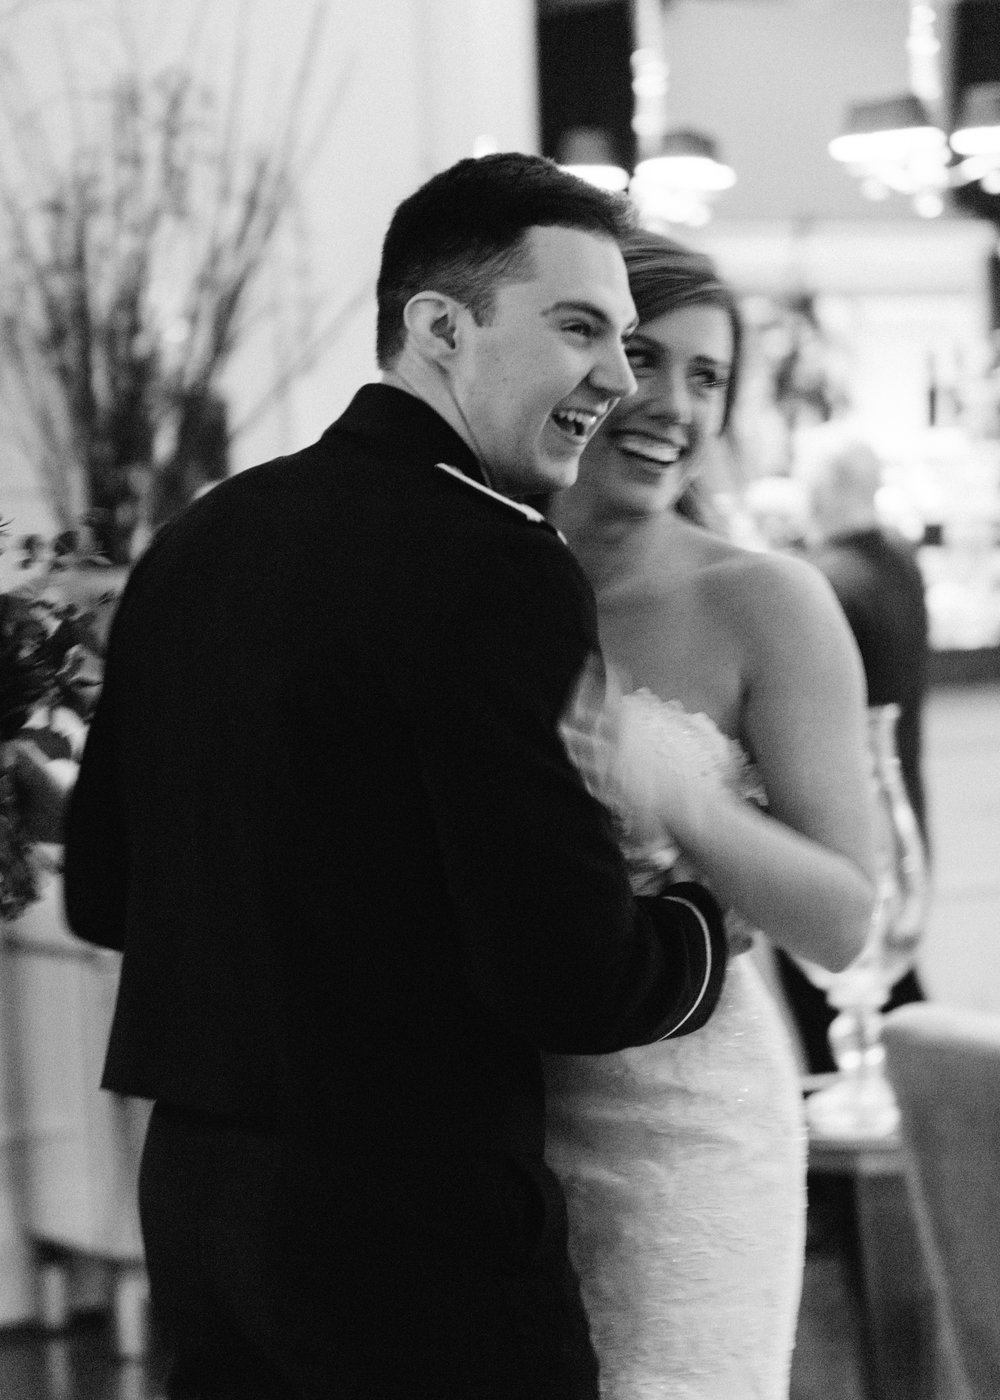 Colorado-Springs-Wedding-Photographer-36.jpg